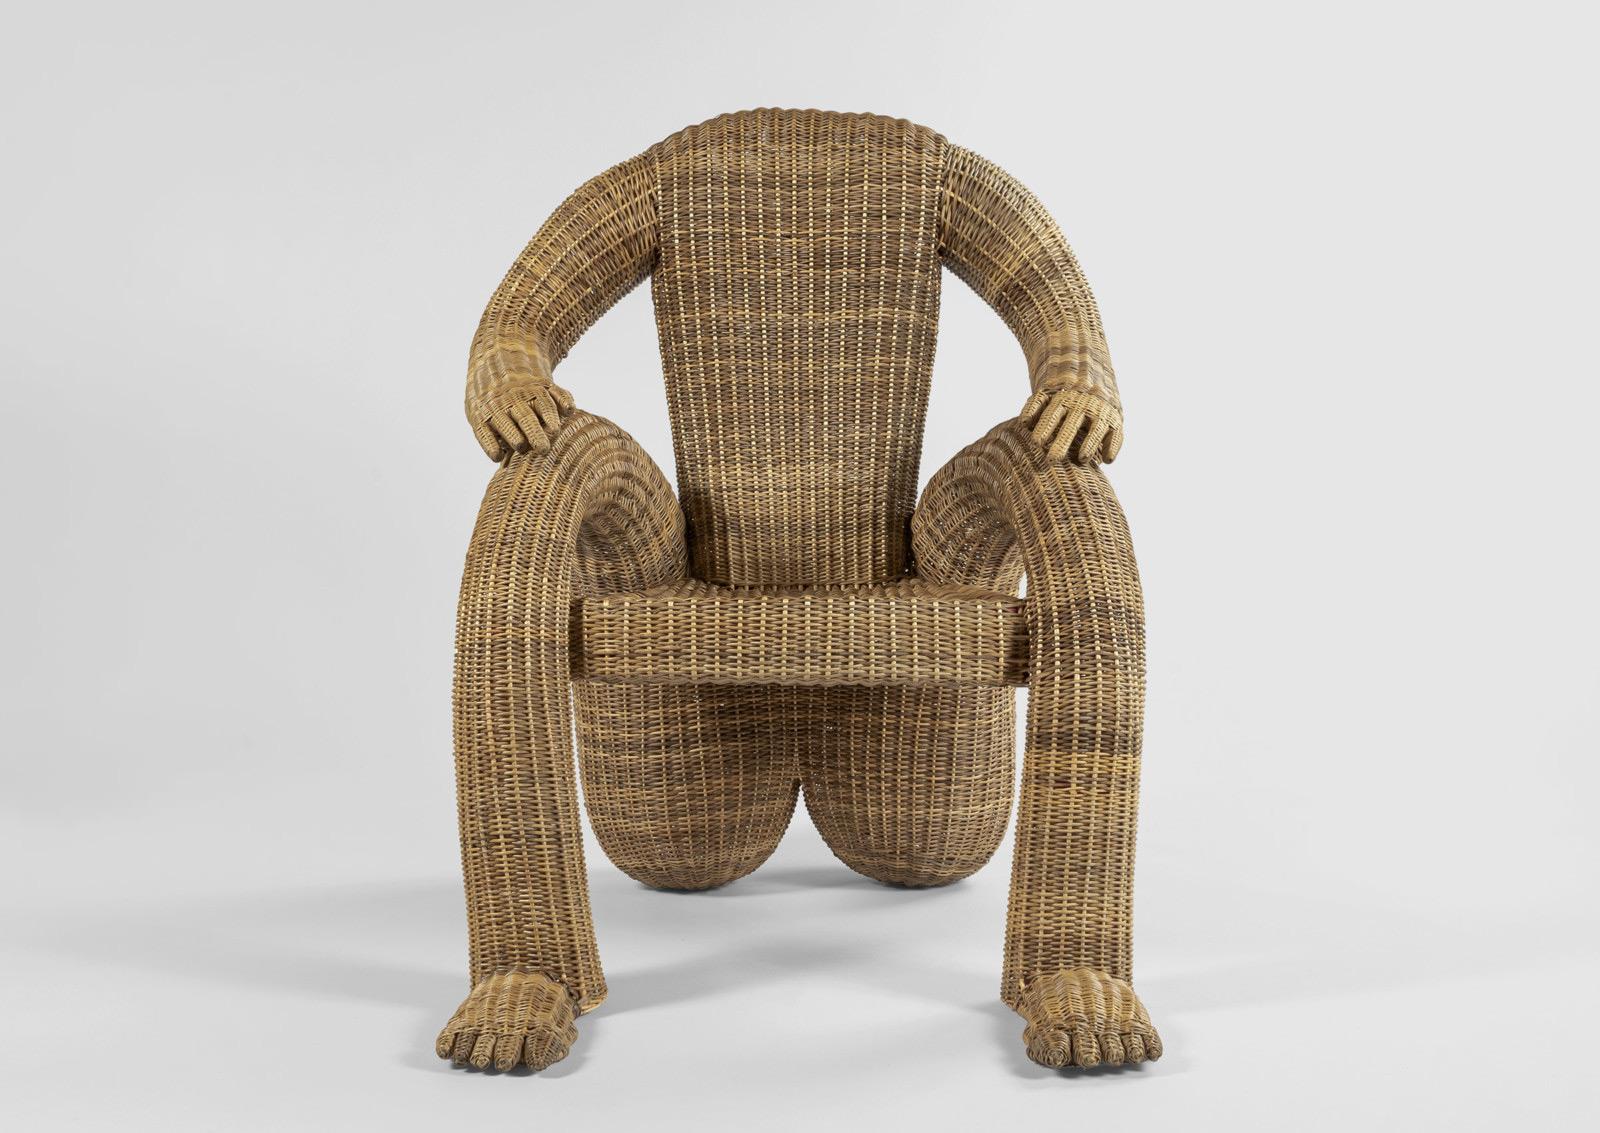 Chris Wolston设计的Nalgona俏皮椅子